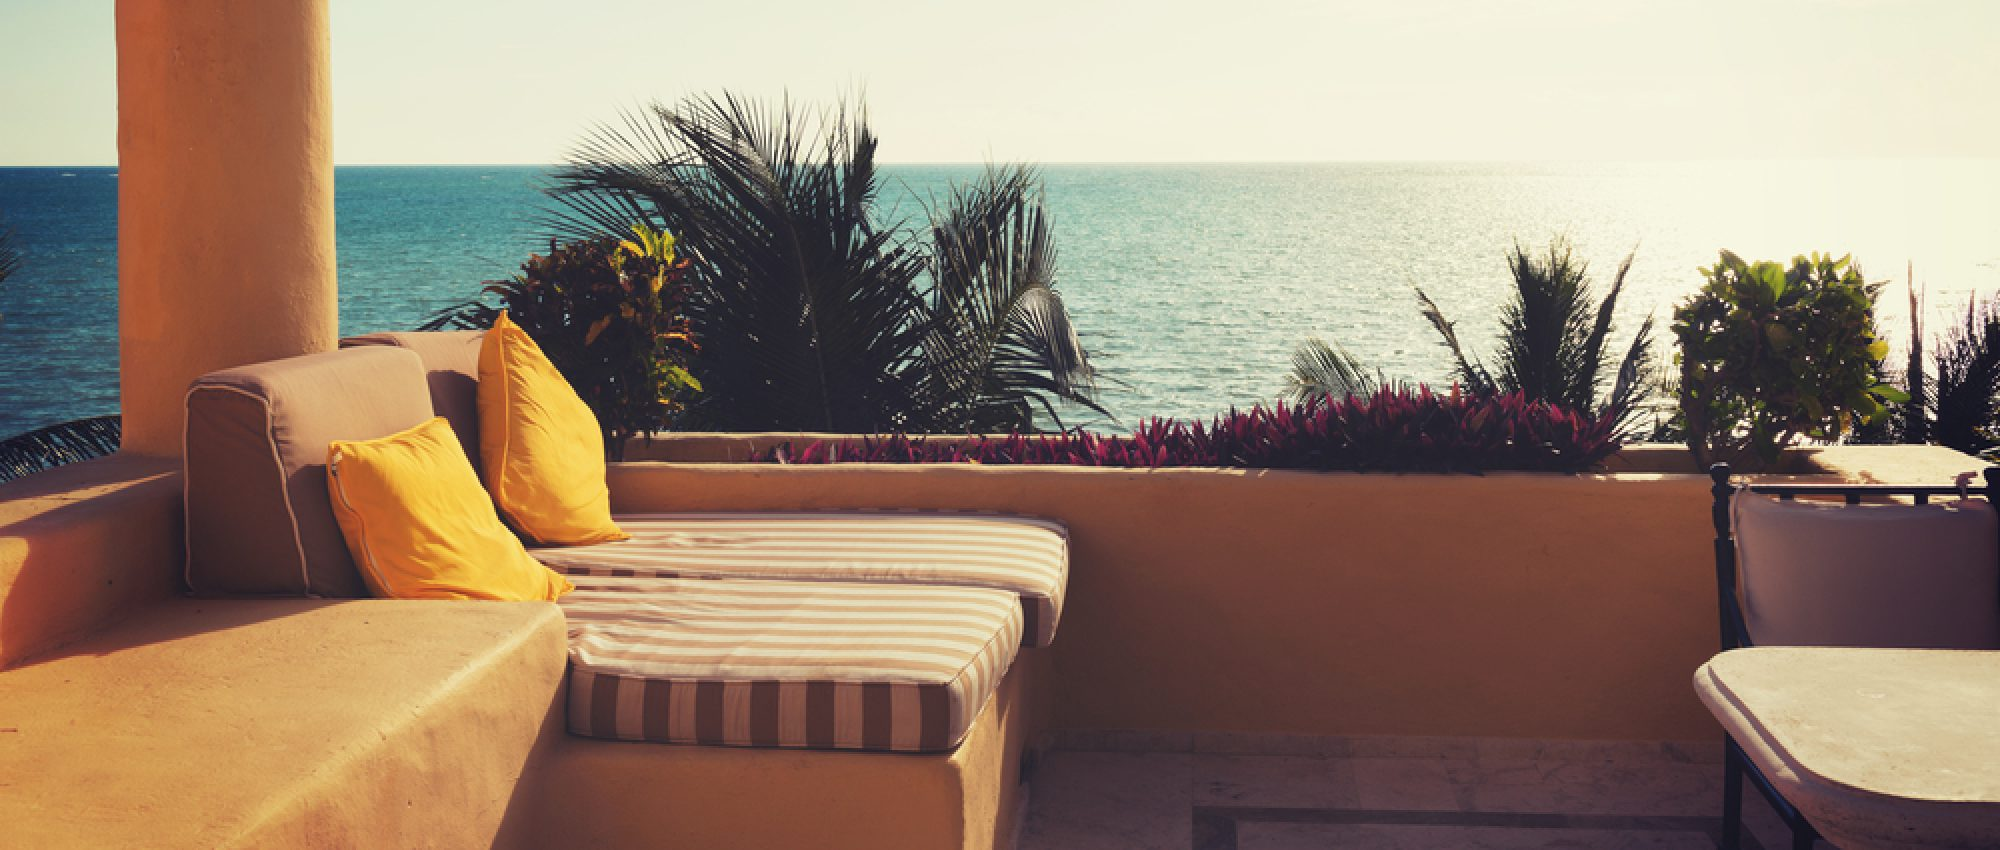 Florida Rental Investment Property Leaders